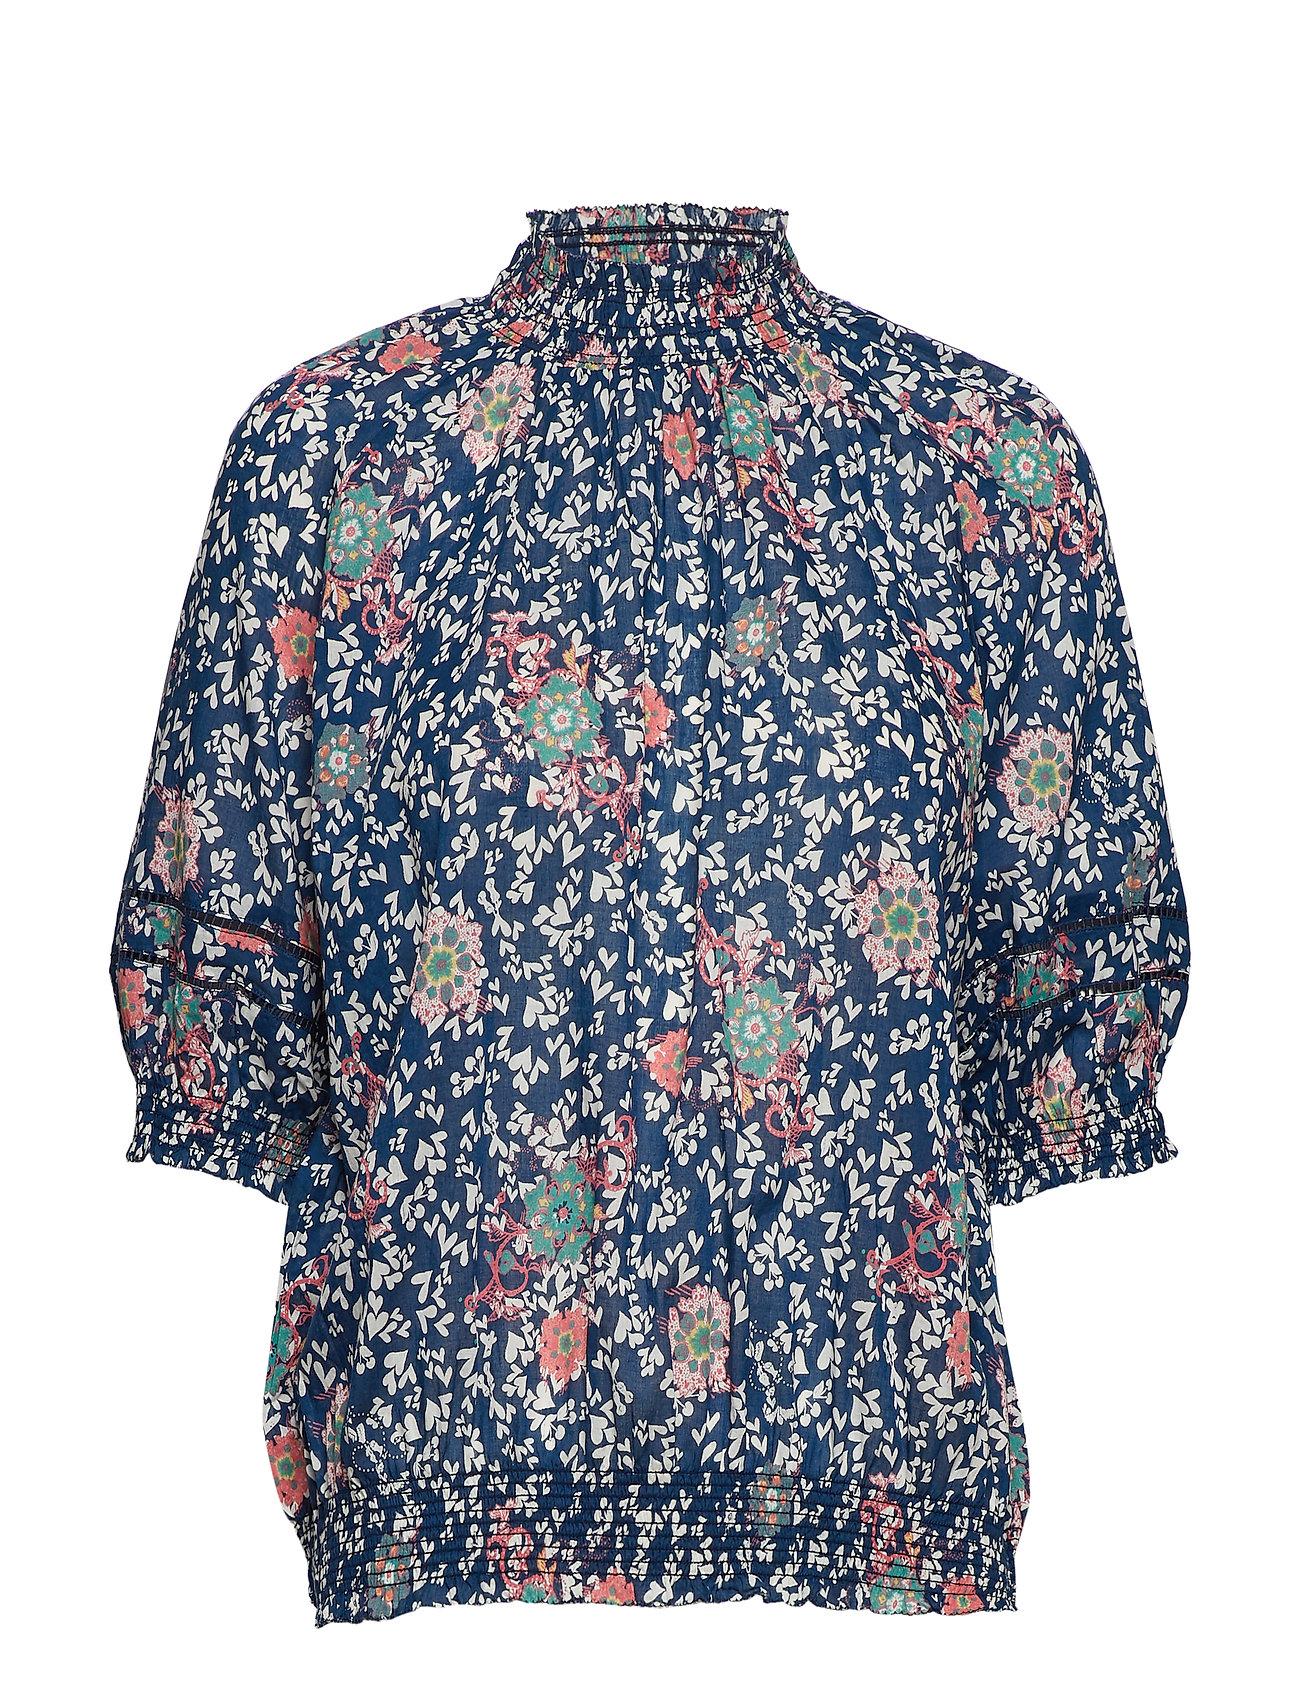 ODD MOLLY lush shake s/s blouse